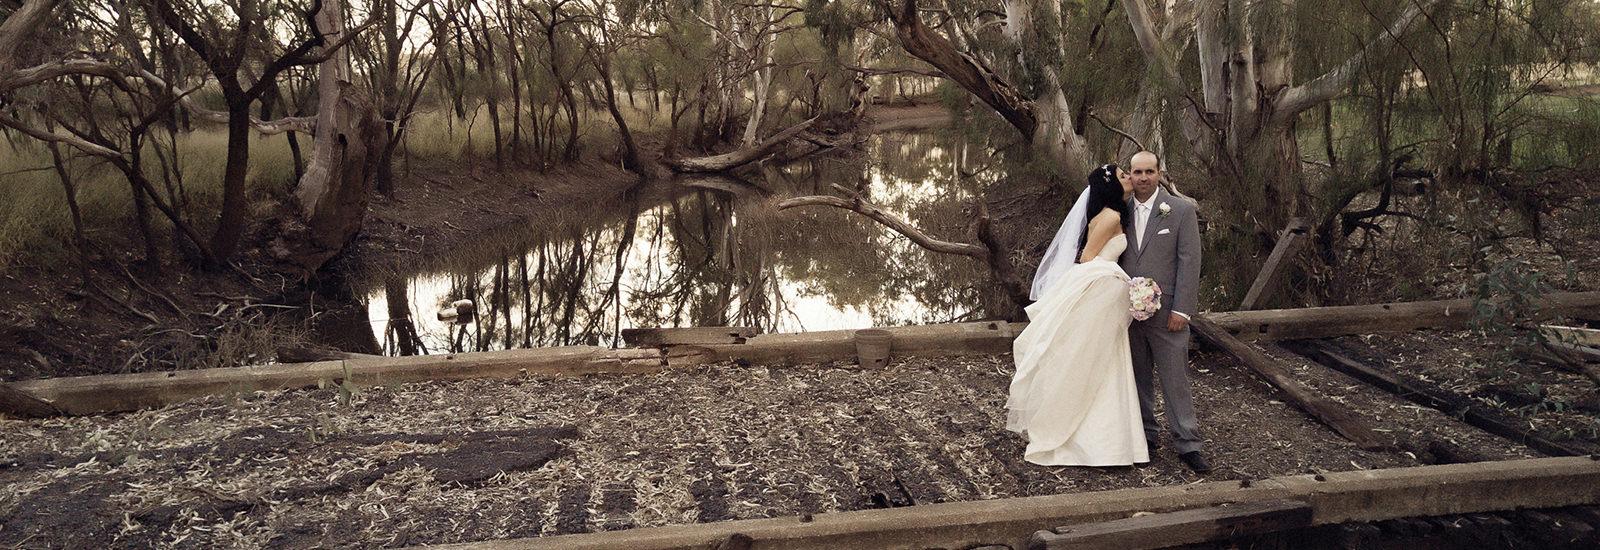 Wedding Video – Tiomi and Ashley